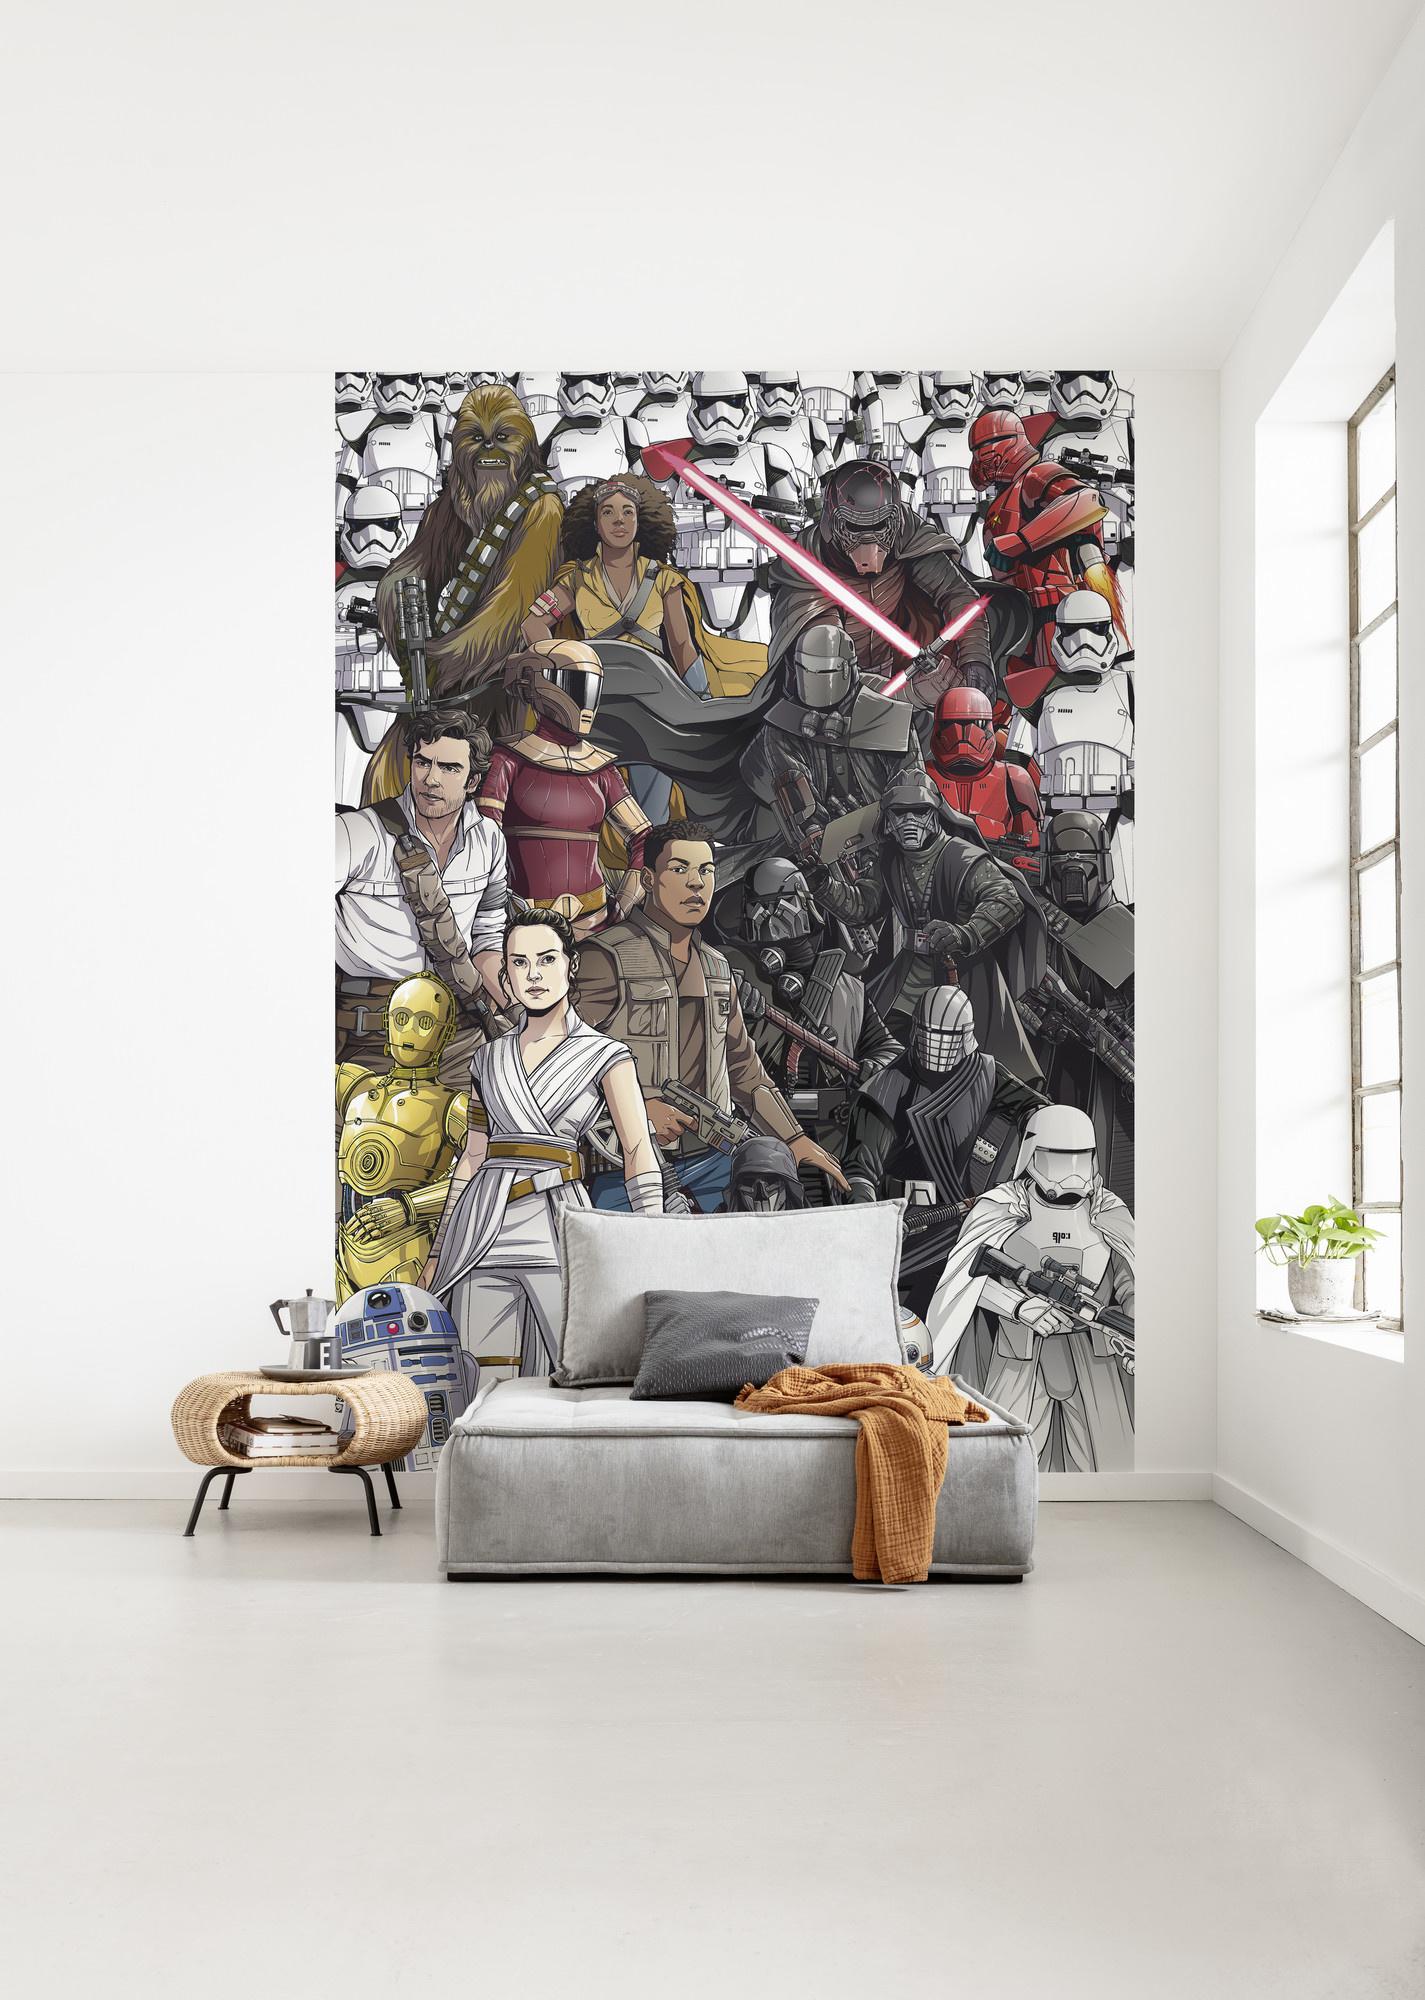 Disney Edition 4 Kinderbehang Komar - Kinderkamer behang Star Wars Retro Cartoon